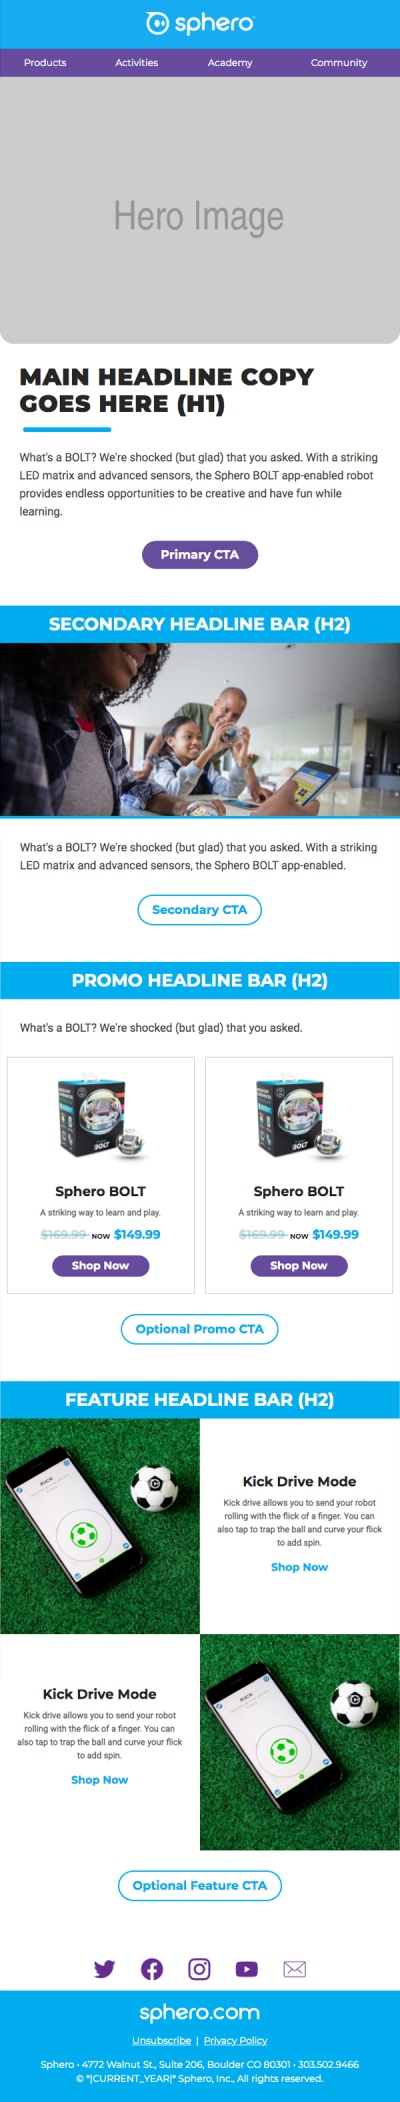 Sphero Mailchimp email template